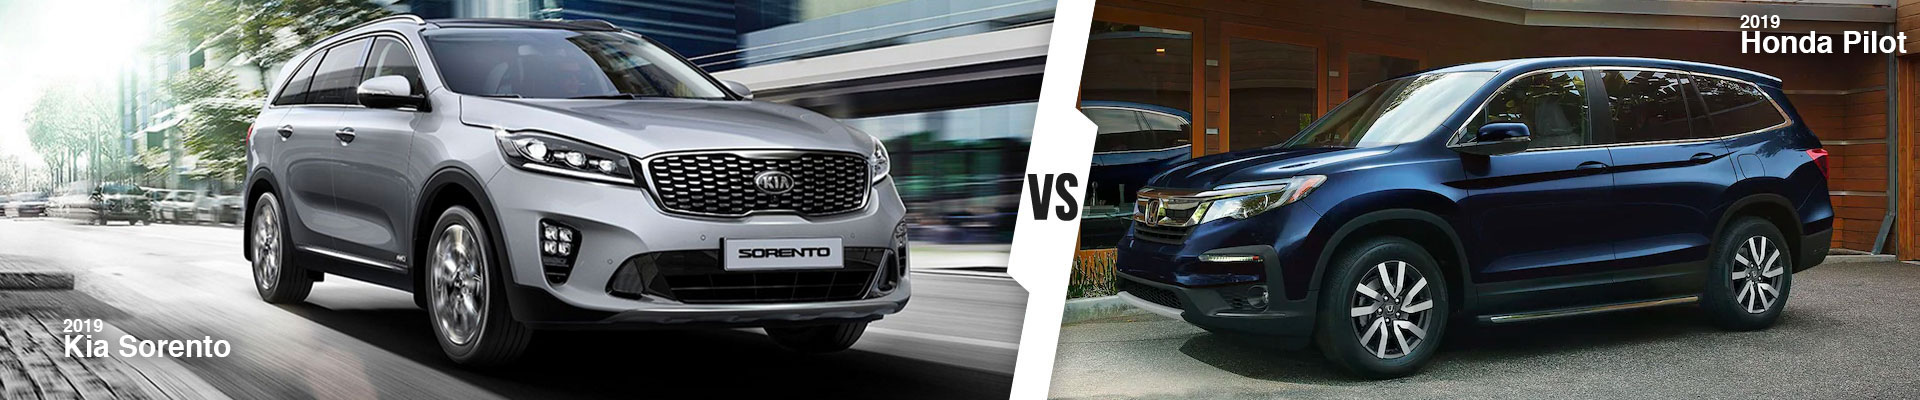 A New SUV Comparison: 2019 Kia Sorento vs. 2019 Honda Pilot